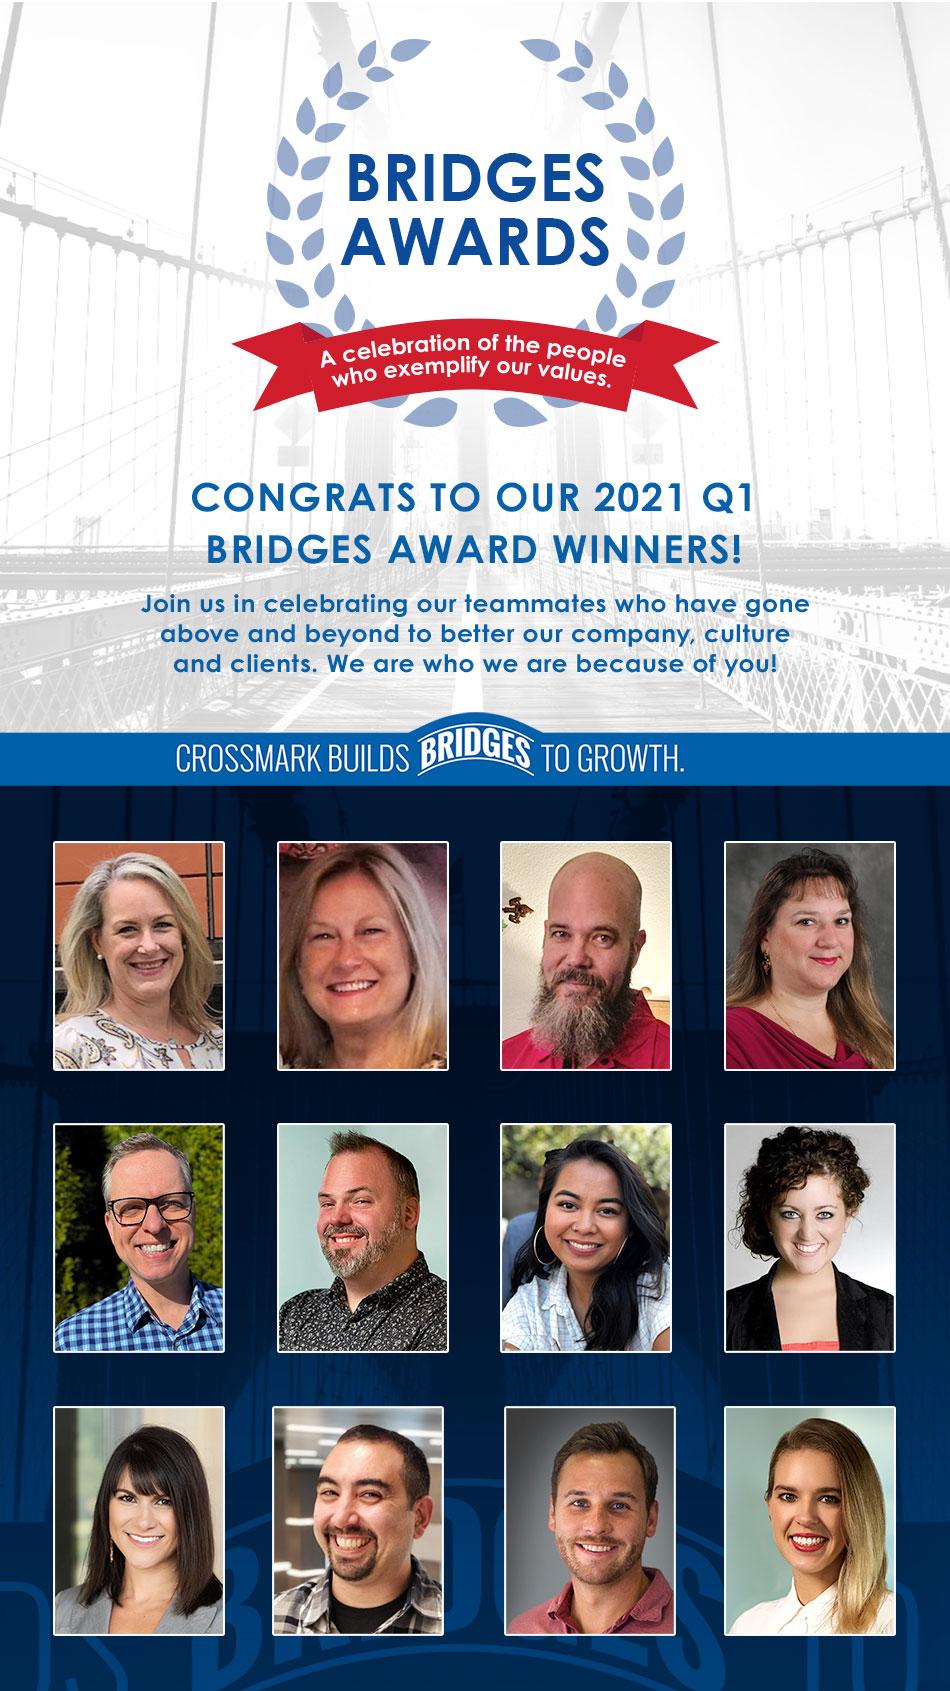 CROSSMARK Q1 2021 BRIDGES Award Winners Named